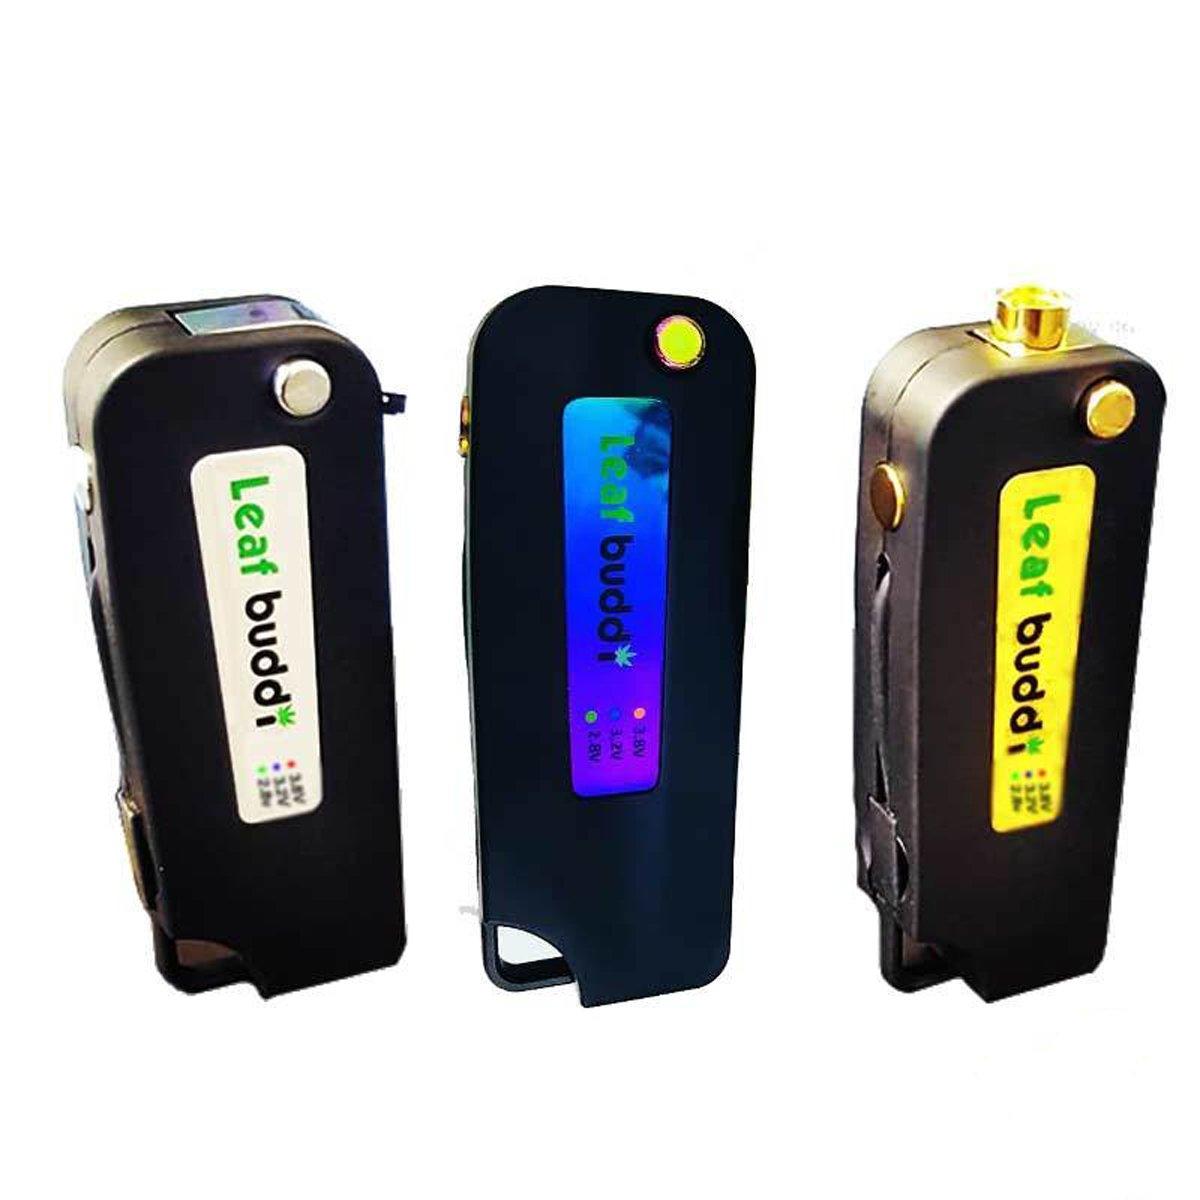 Leaf Buddi Key Box V Pro Variable Voltage 350mAh 510 CE3 Key Fob Box Mod With Built In USB Charger